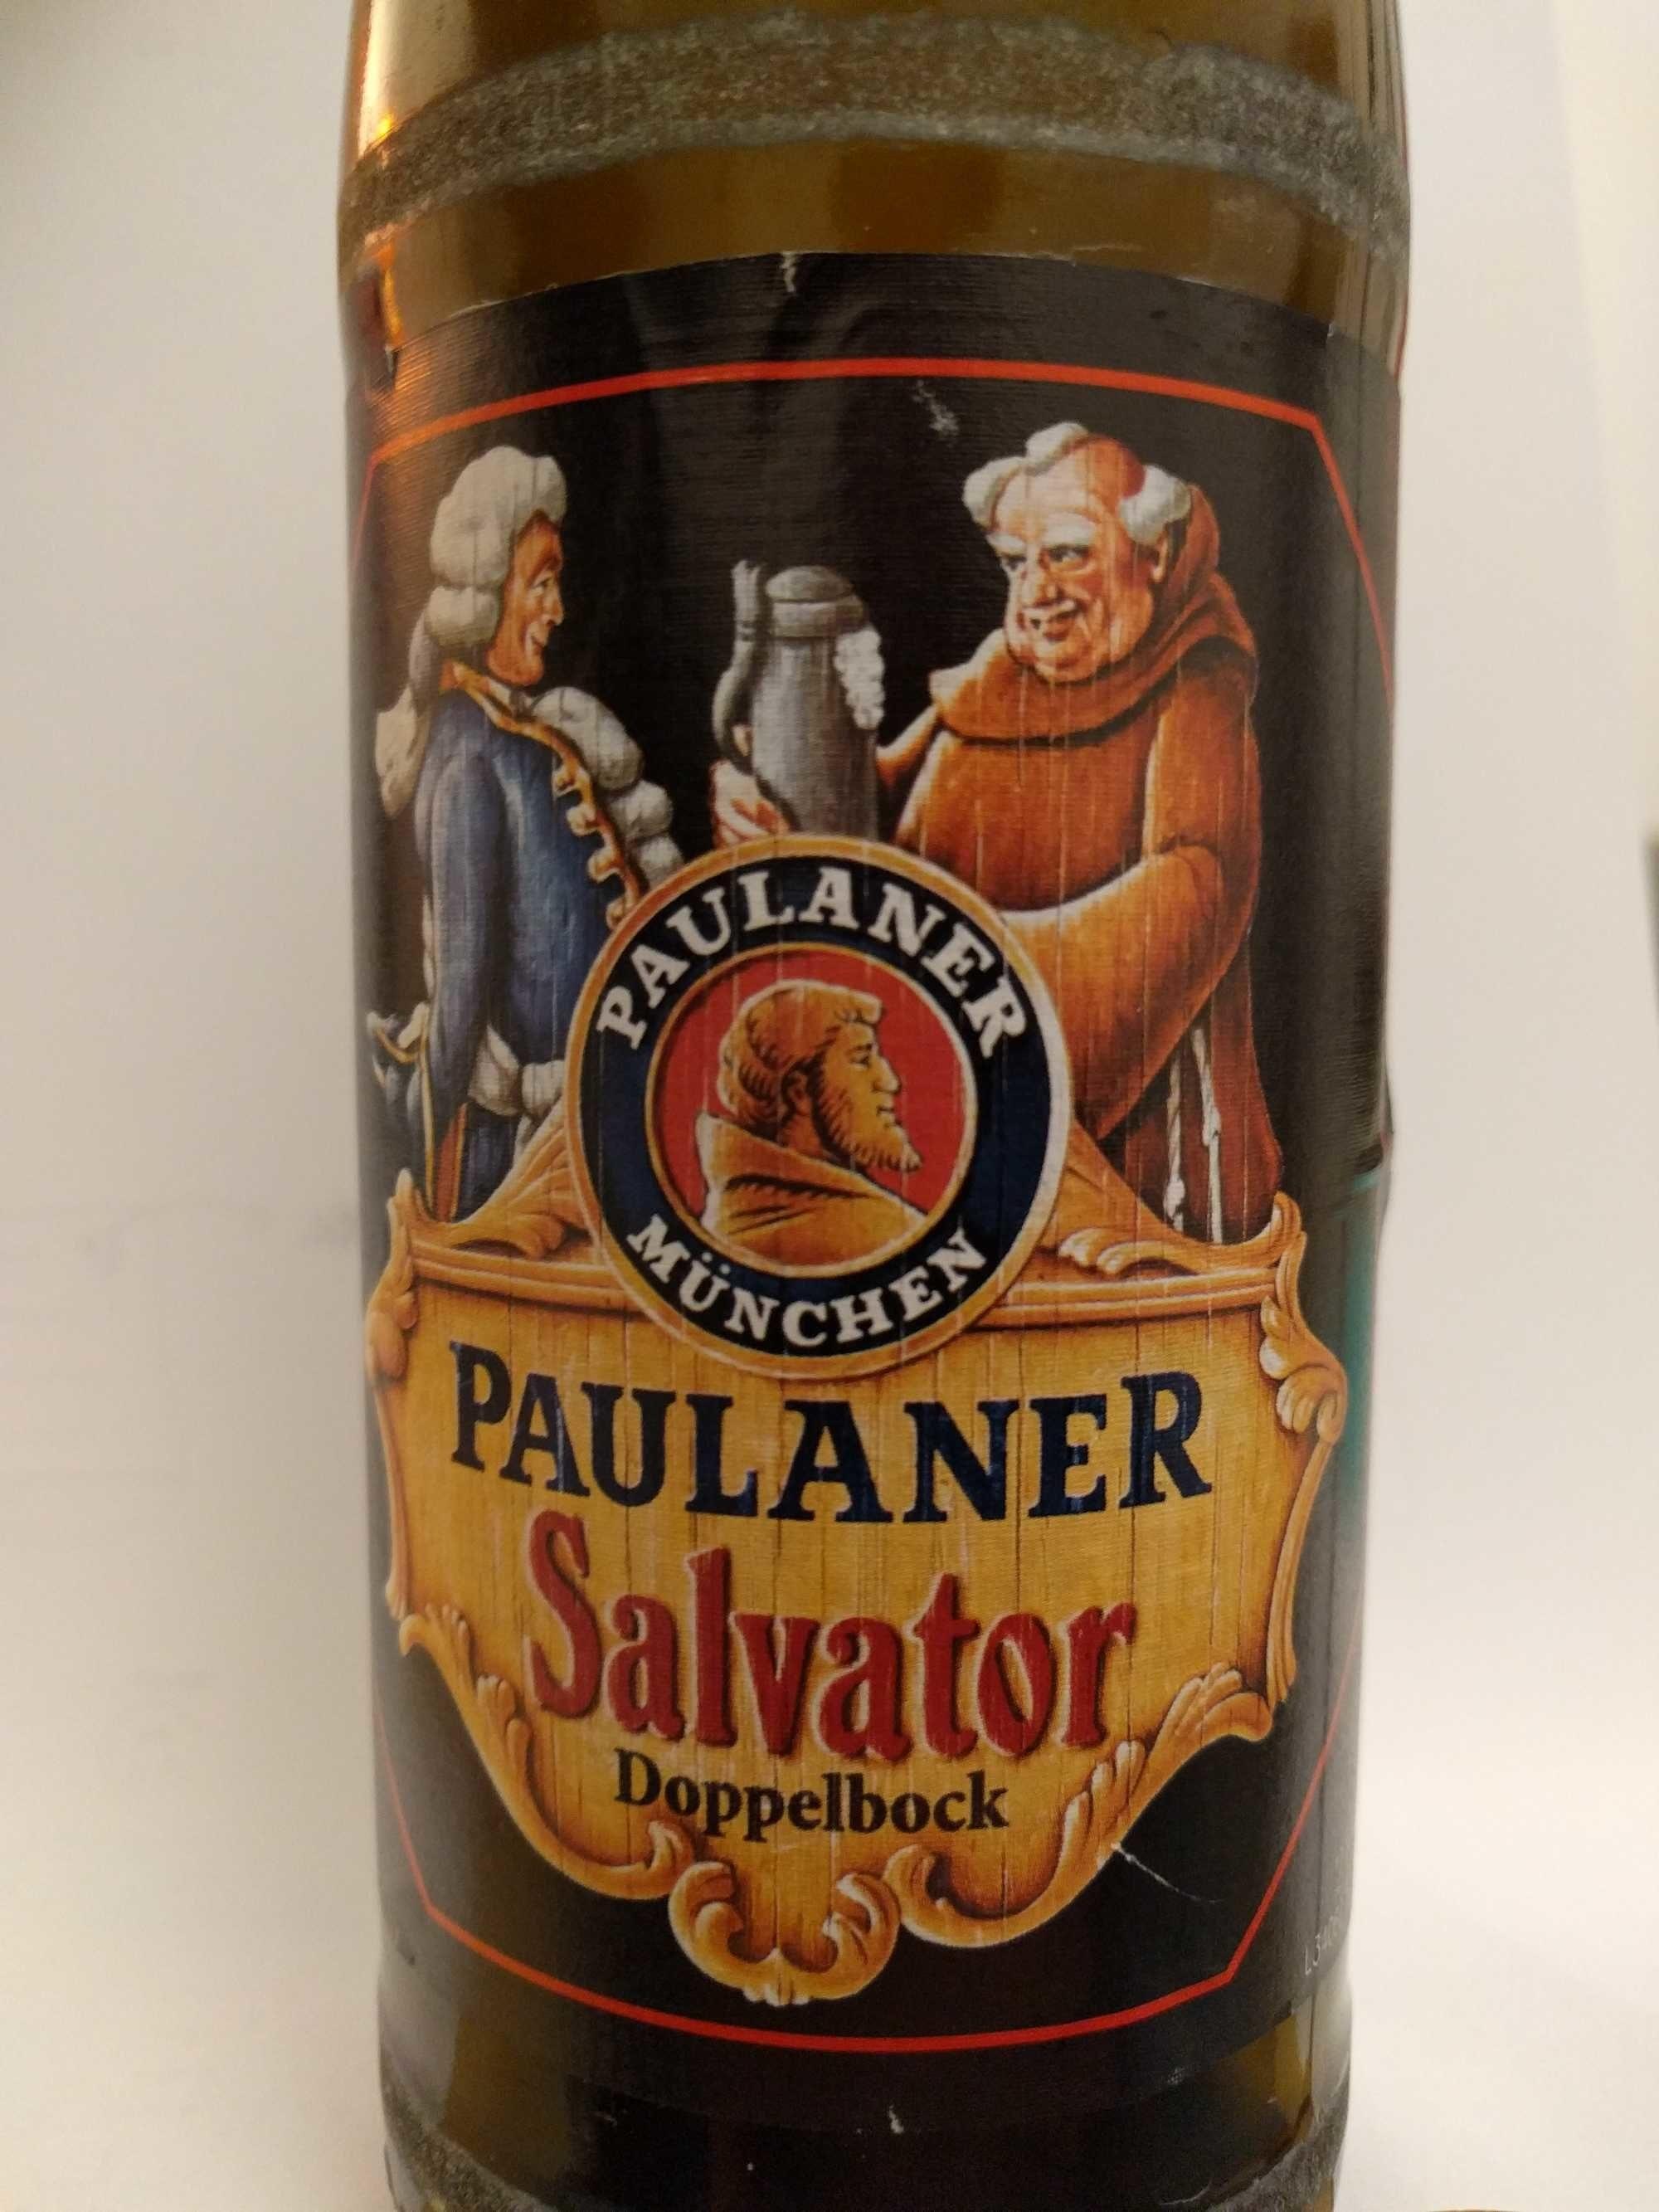 Paulaner Salvator Doppelbock 6pk